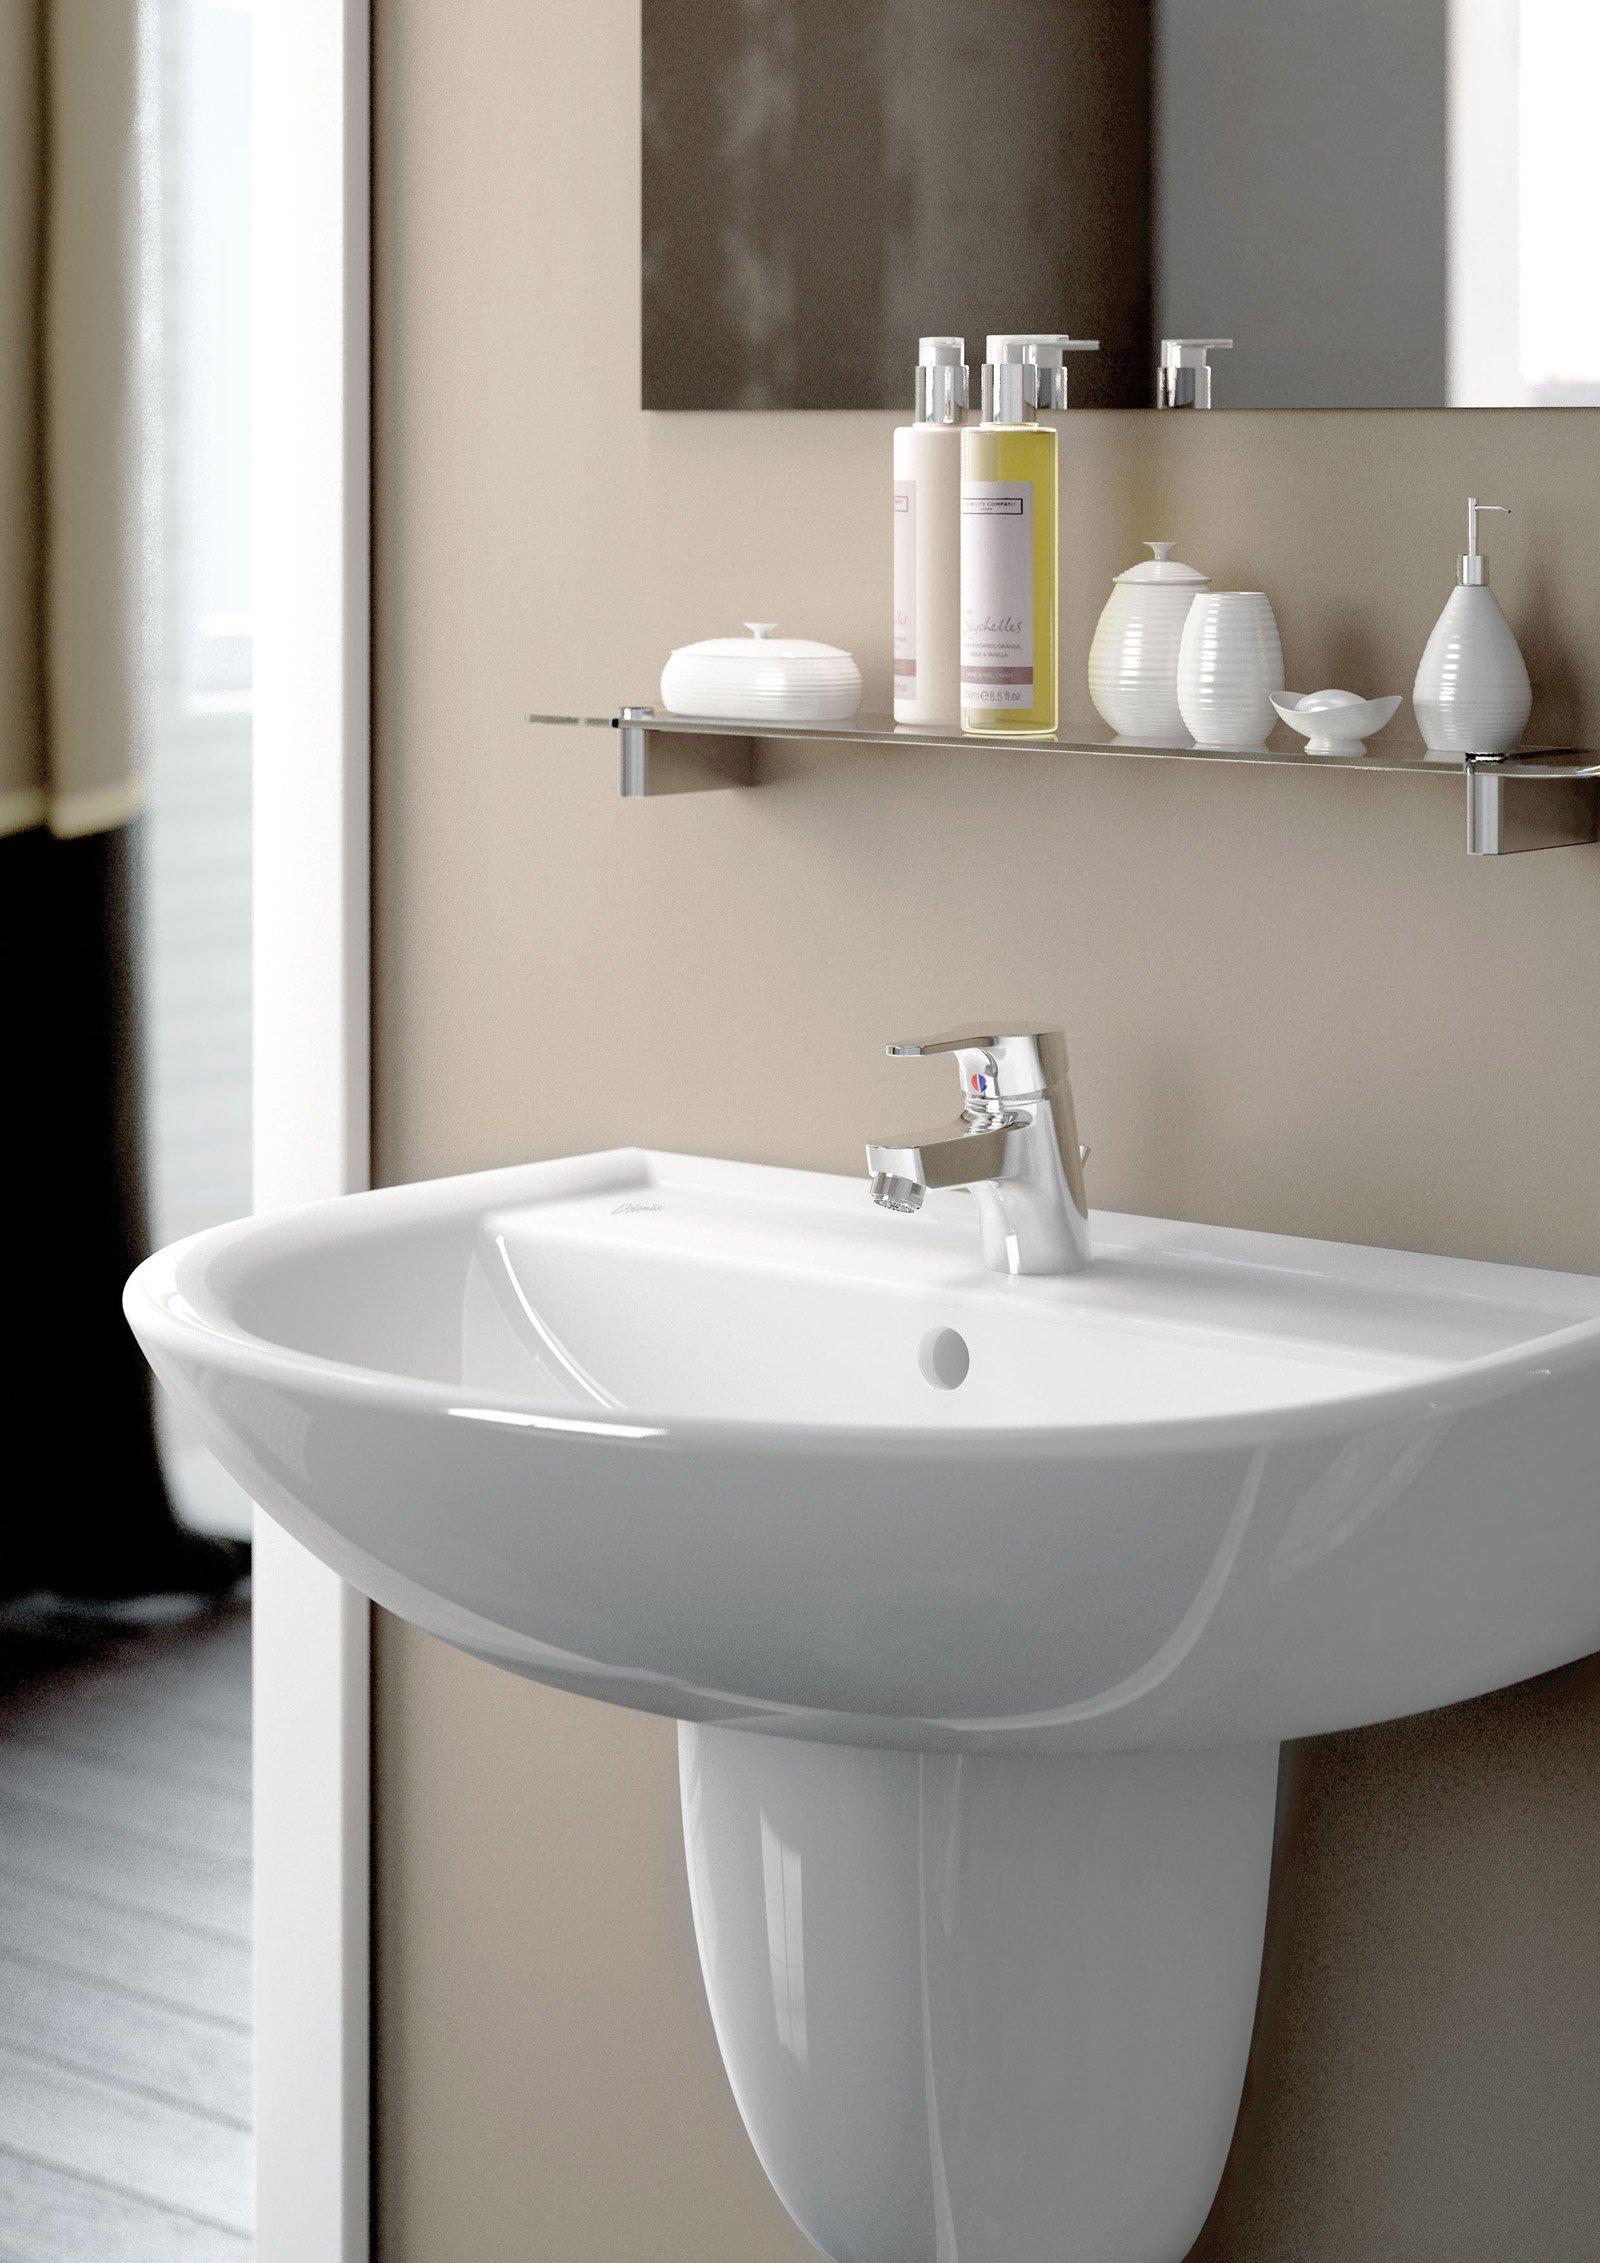 lavabi low cost cose di casa. Black Bedroom Furniture Sets. Home Design Ideas